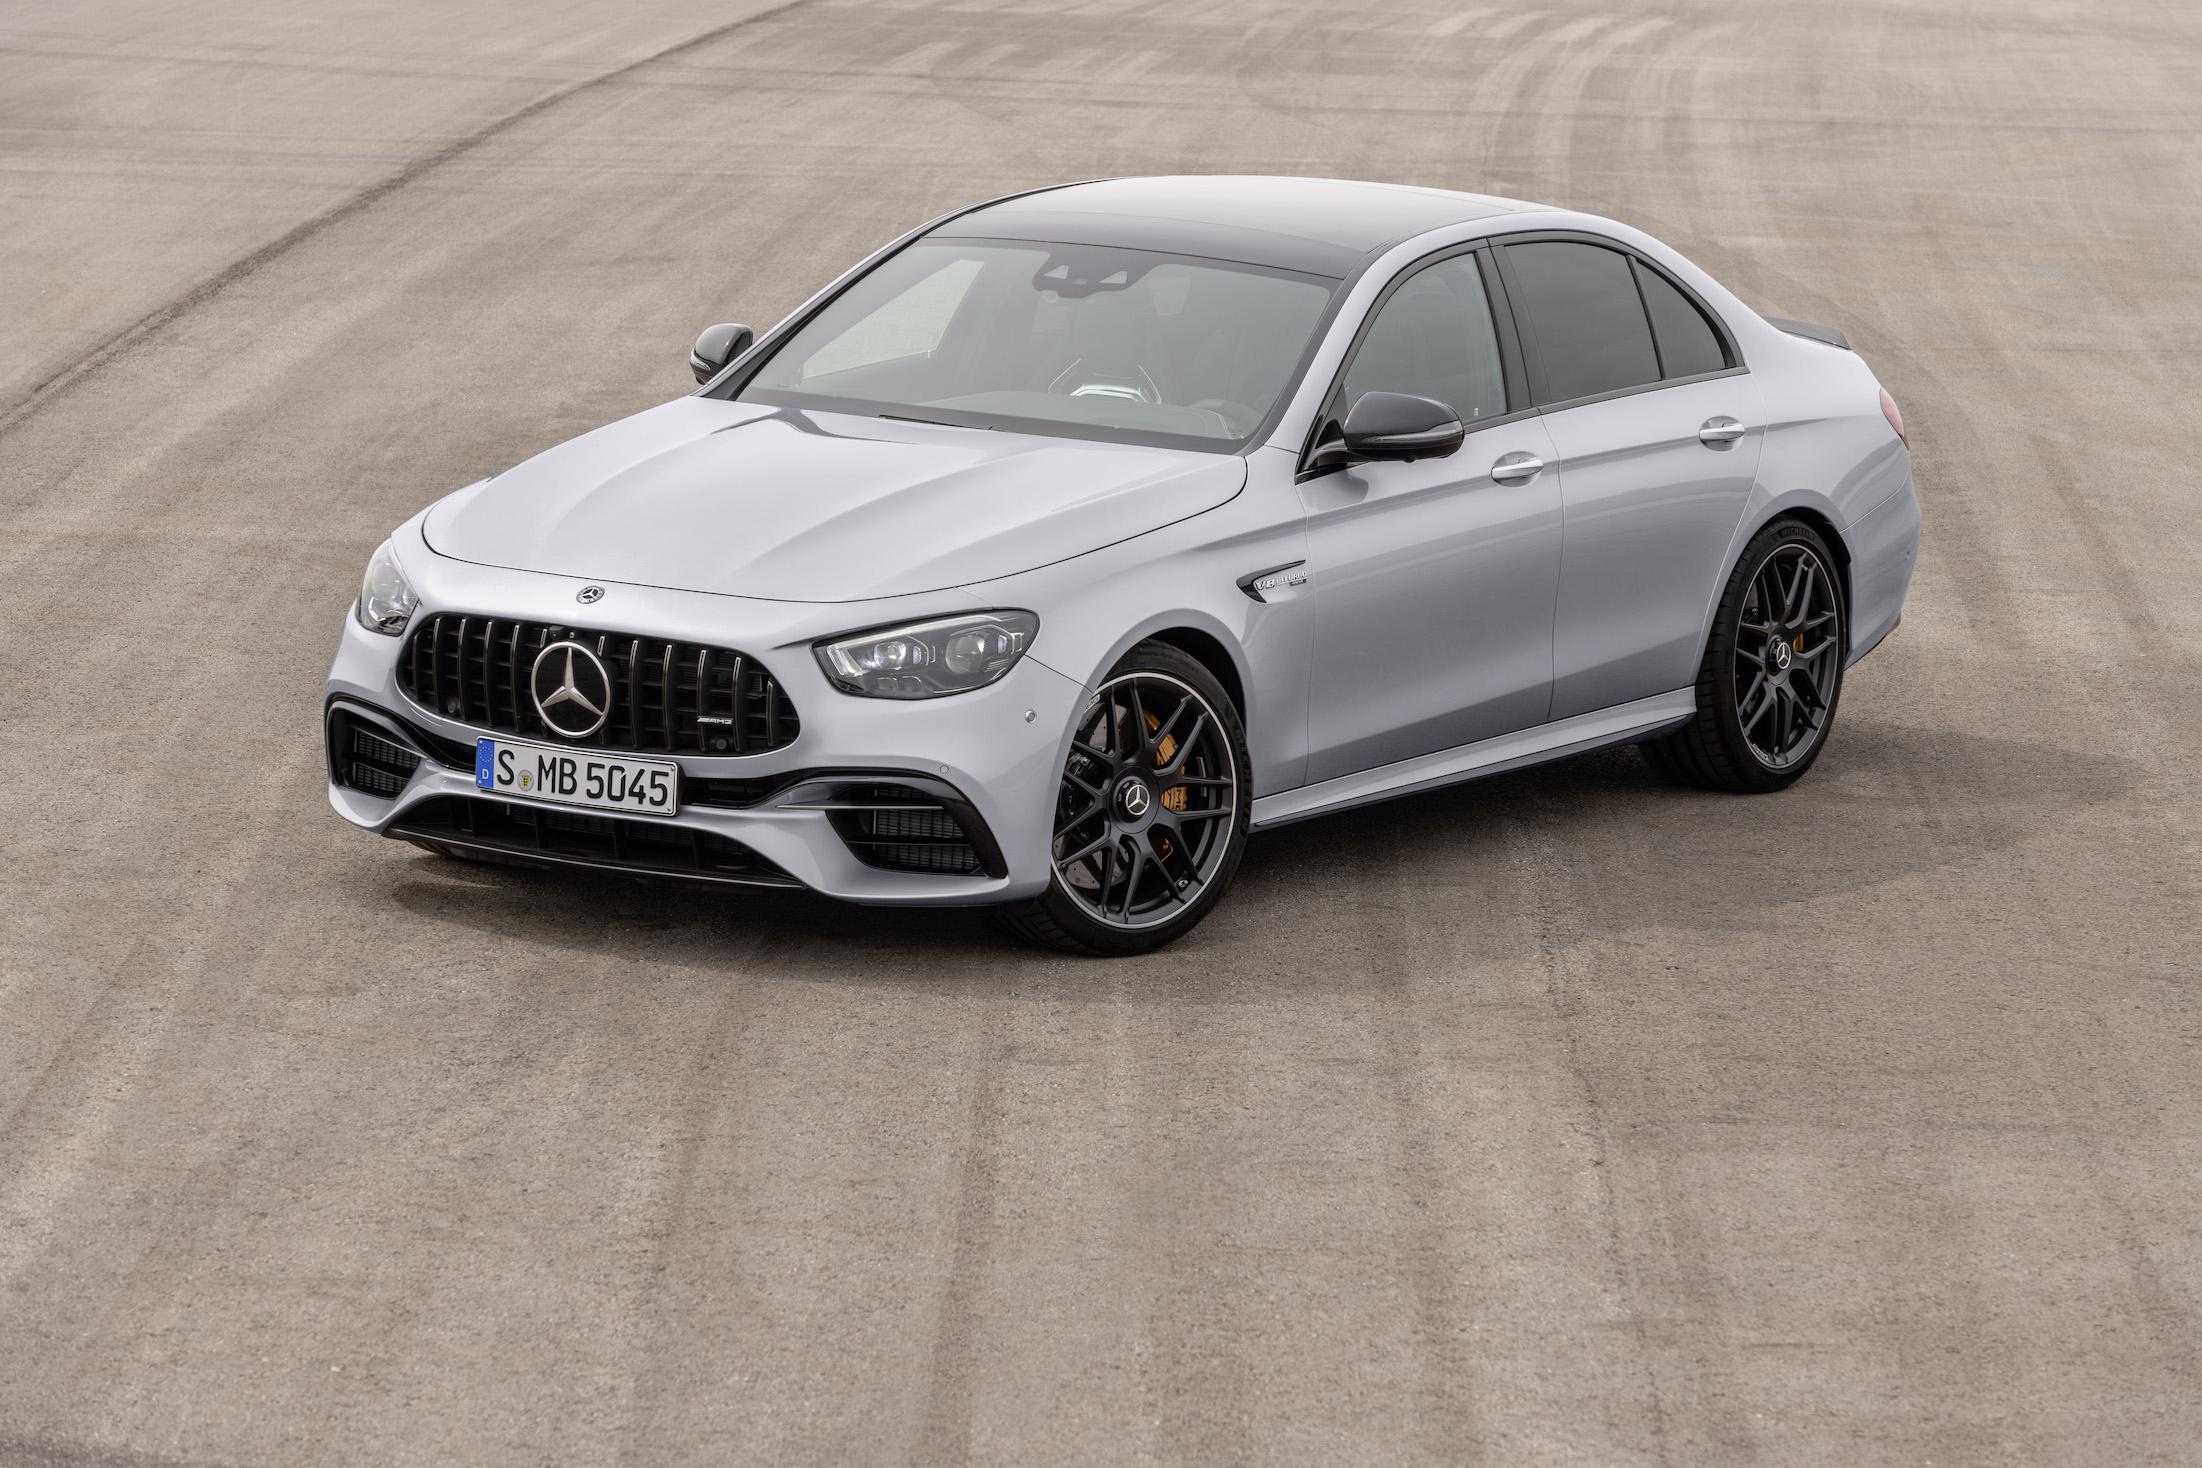 The new Mercedes-AMG E 63 S 4MATIC+ Sedan